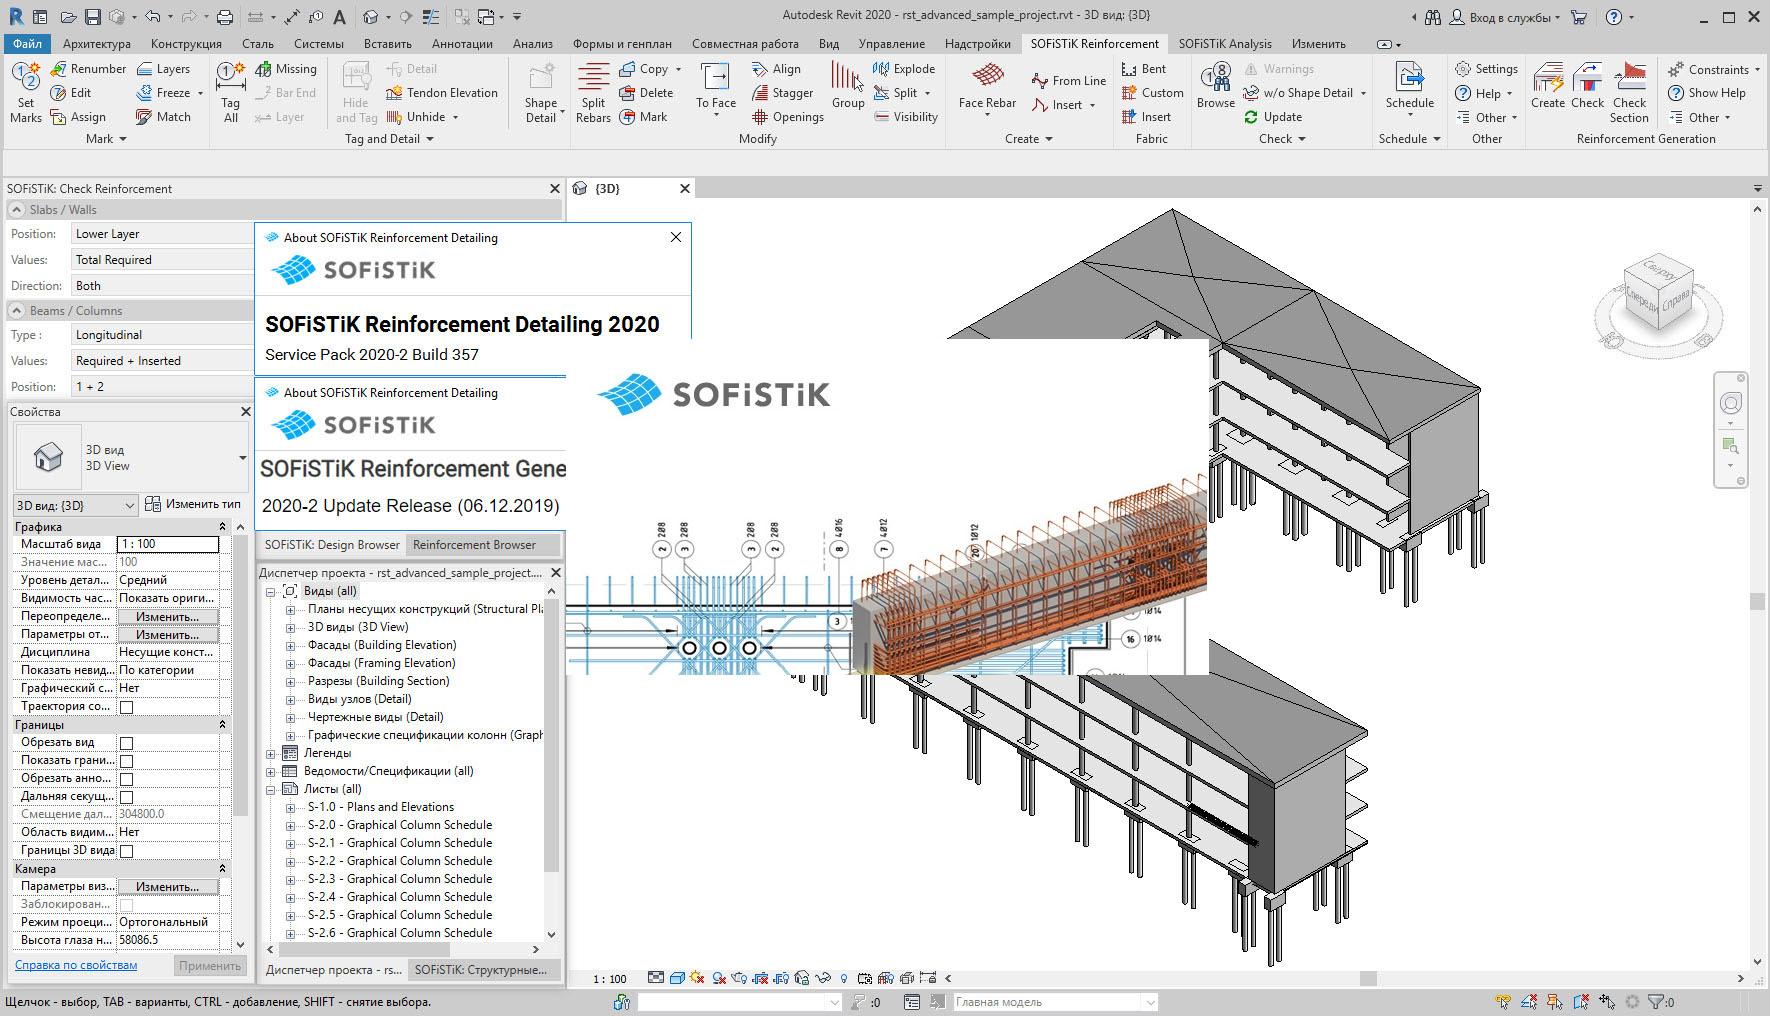 Working with SOFiSTiK Reinforcement Detailing & Reinforcement Generation 2020 SP 2020-2 Build 357